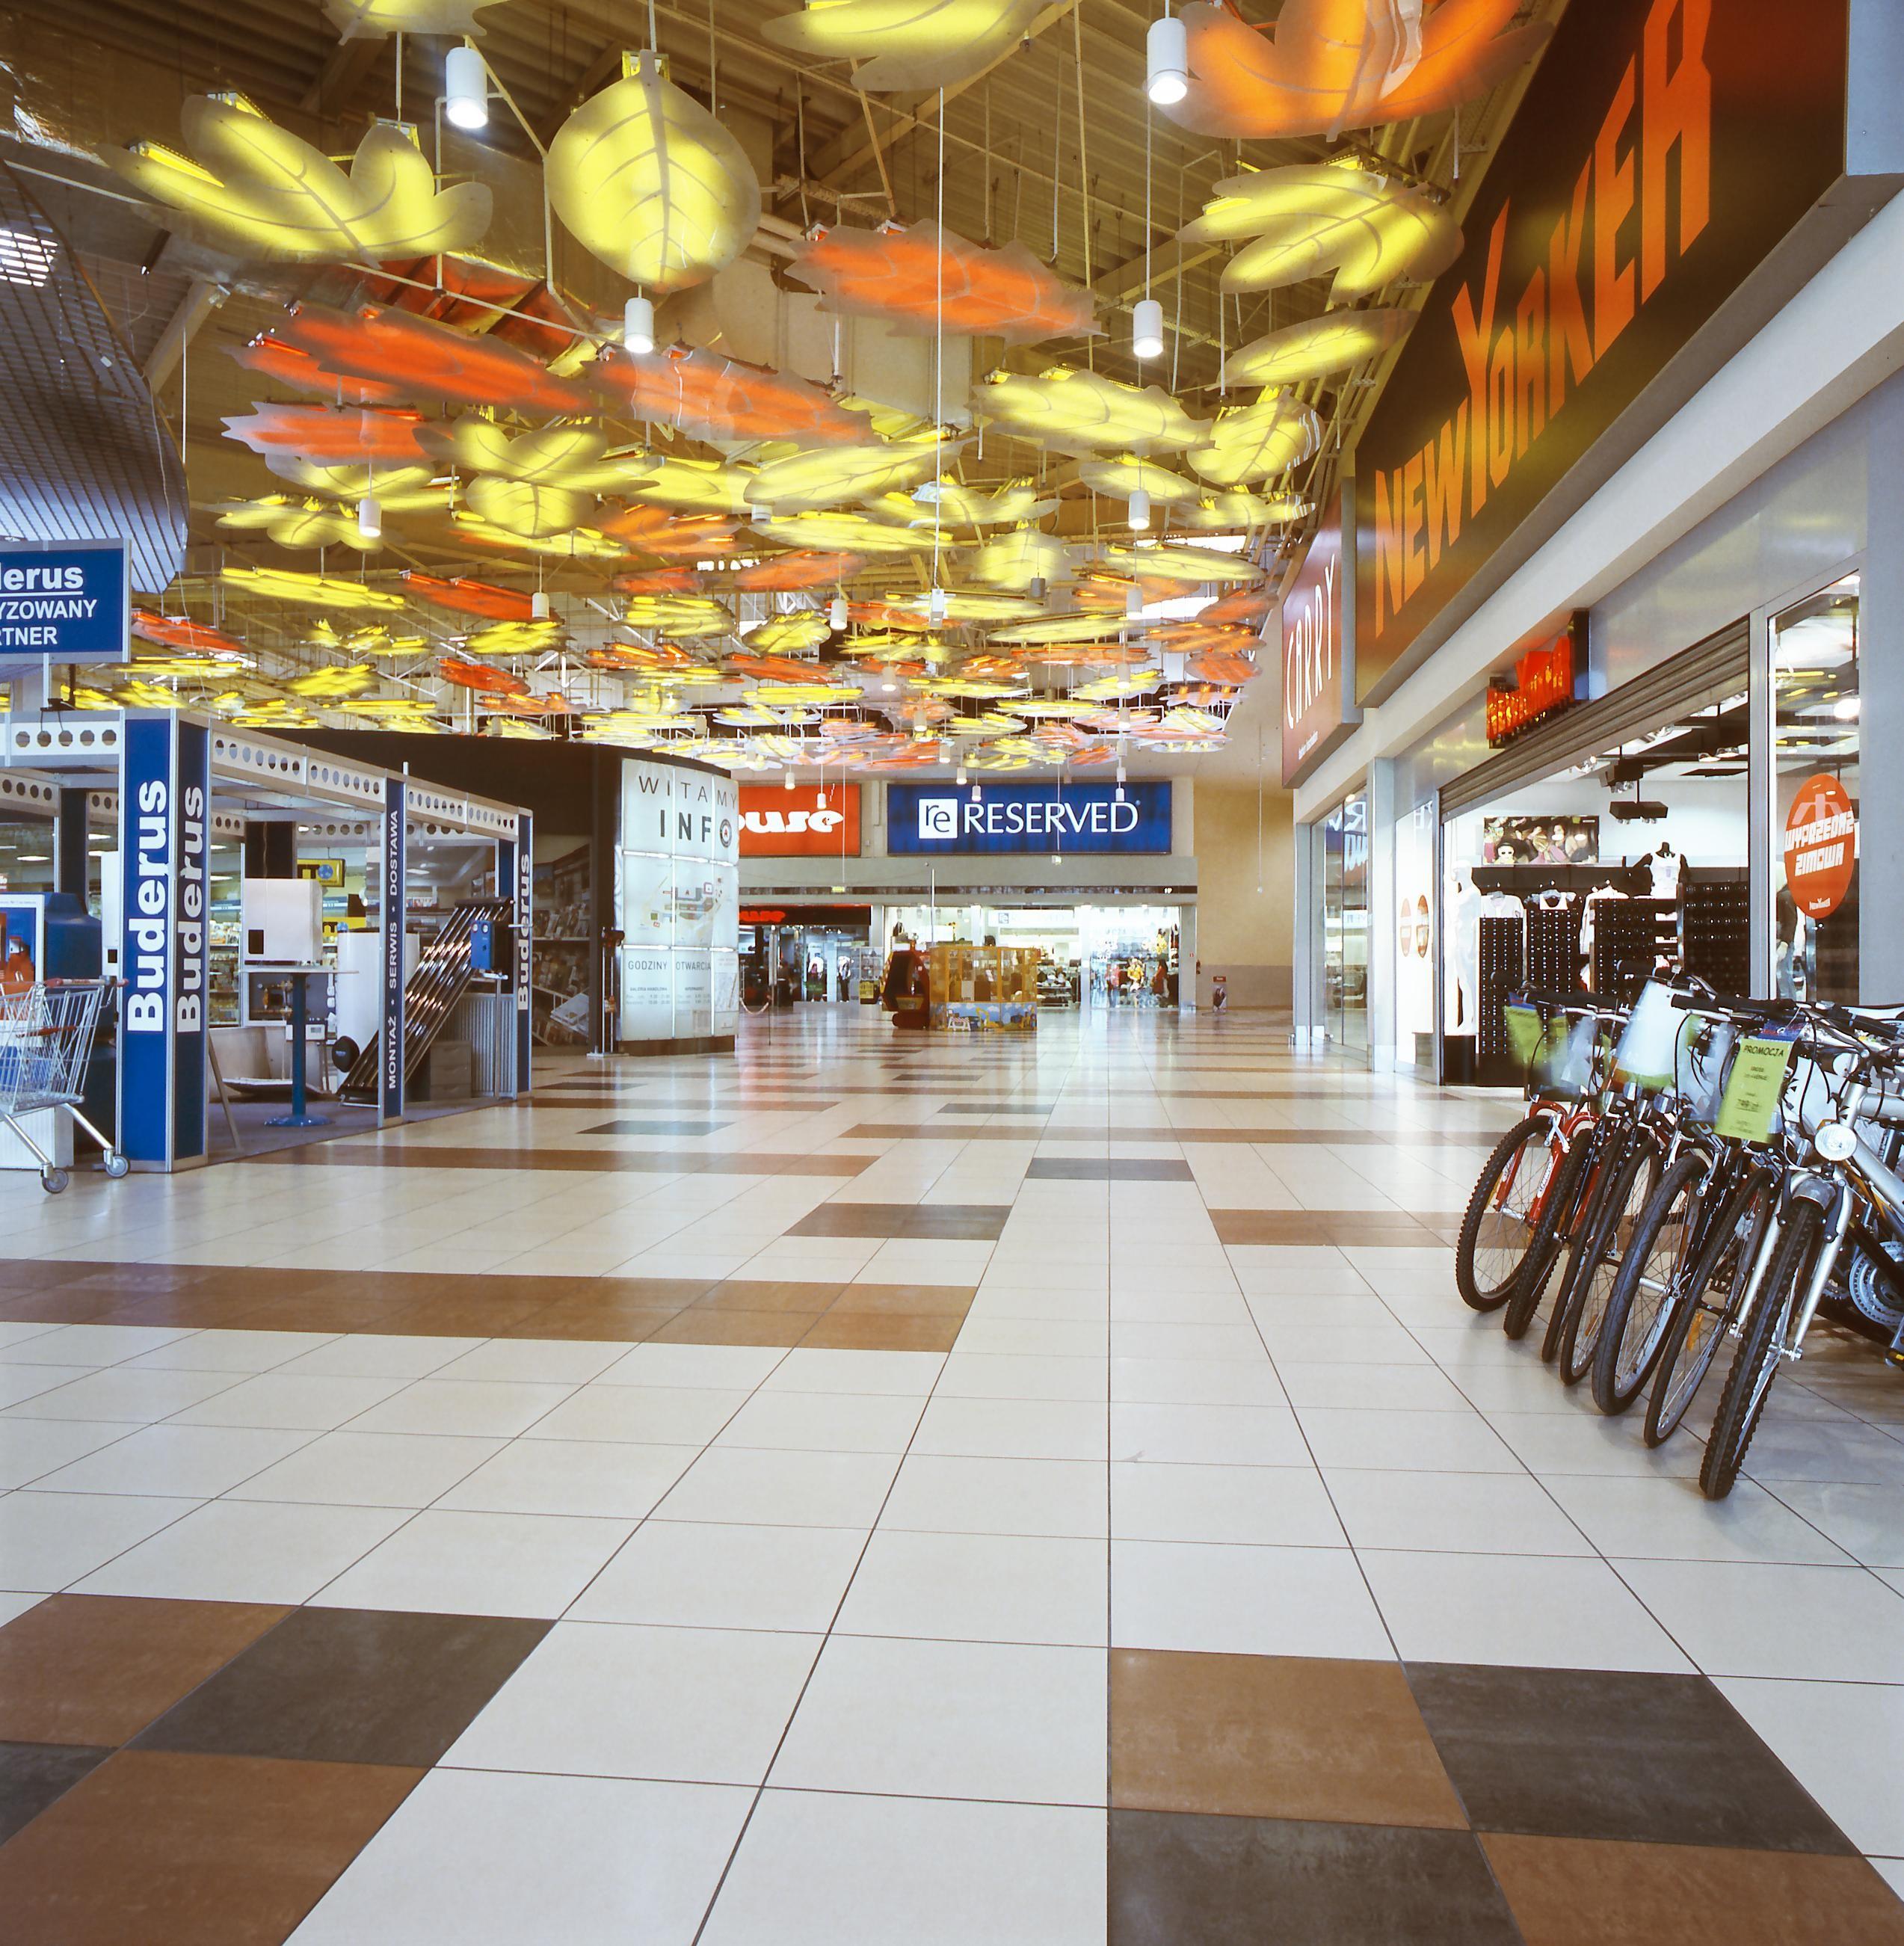 AtlasConcorde Auchan Polonia 012